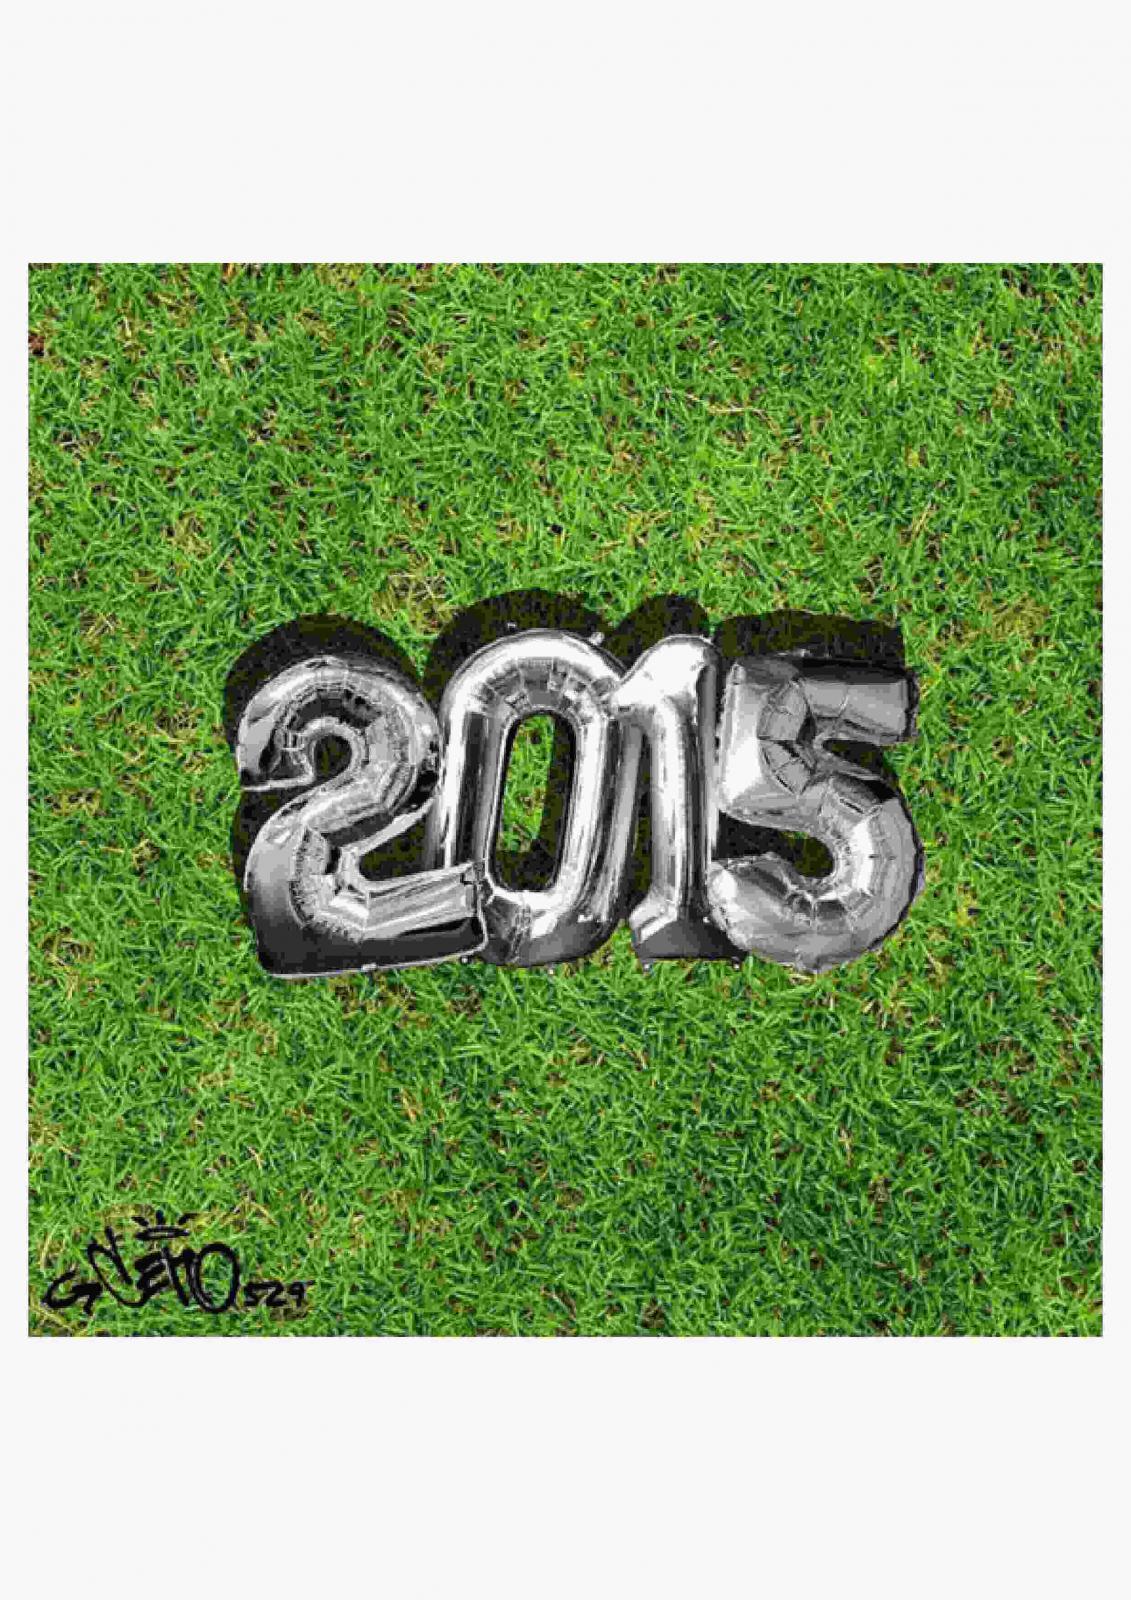 Upcoming: ceno529 - 2015